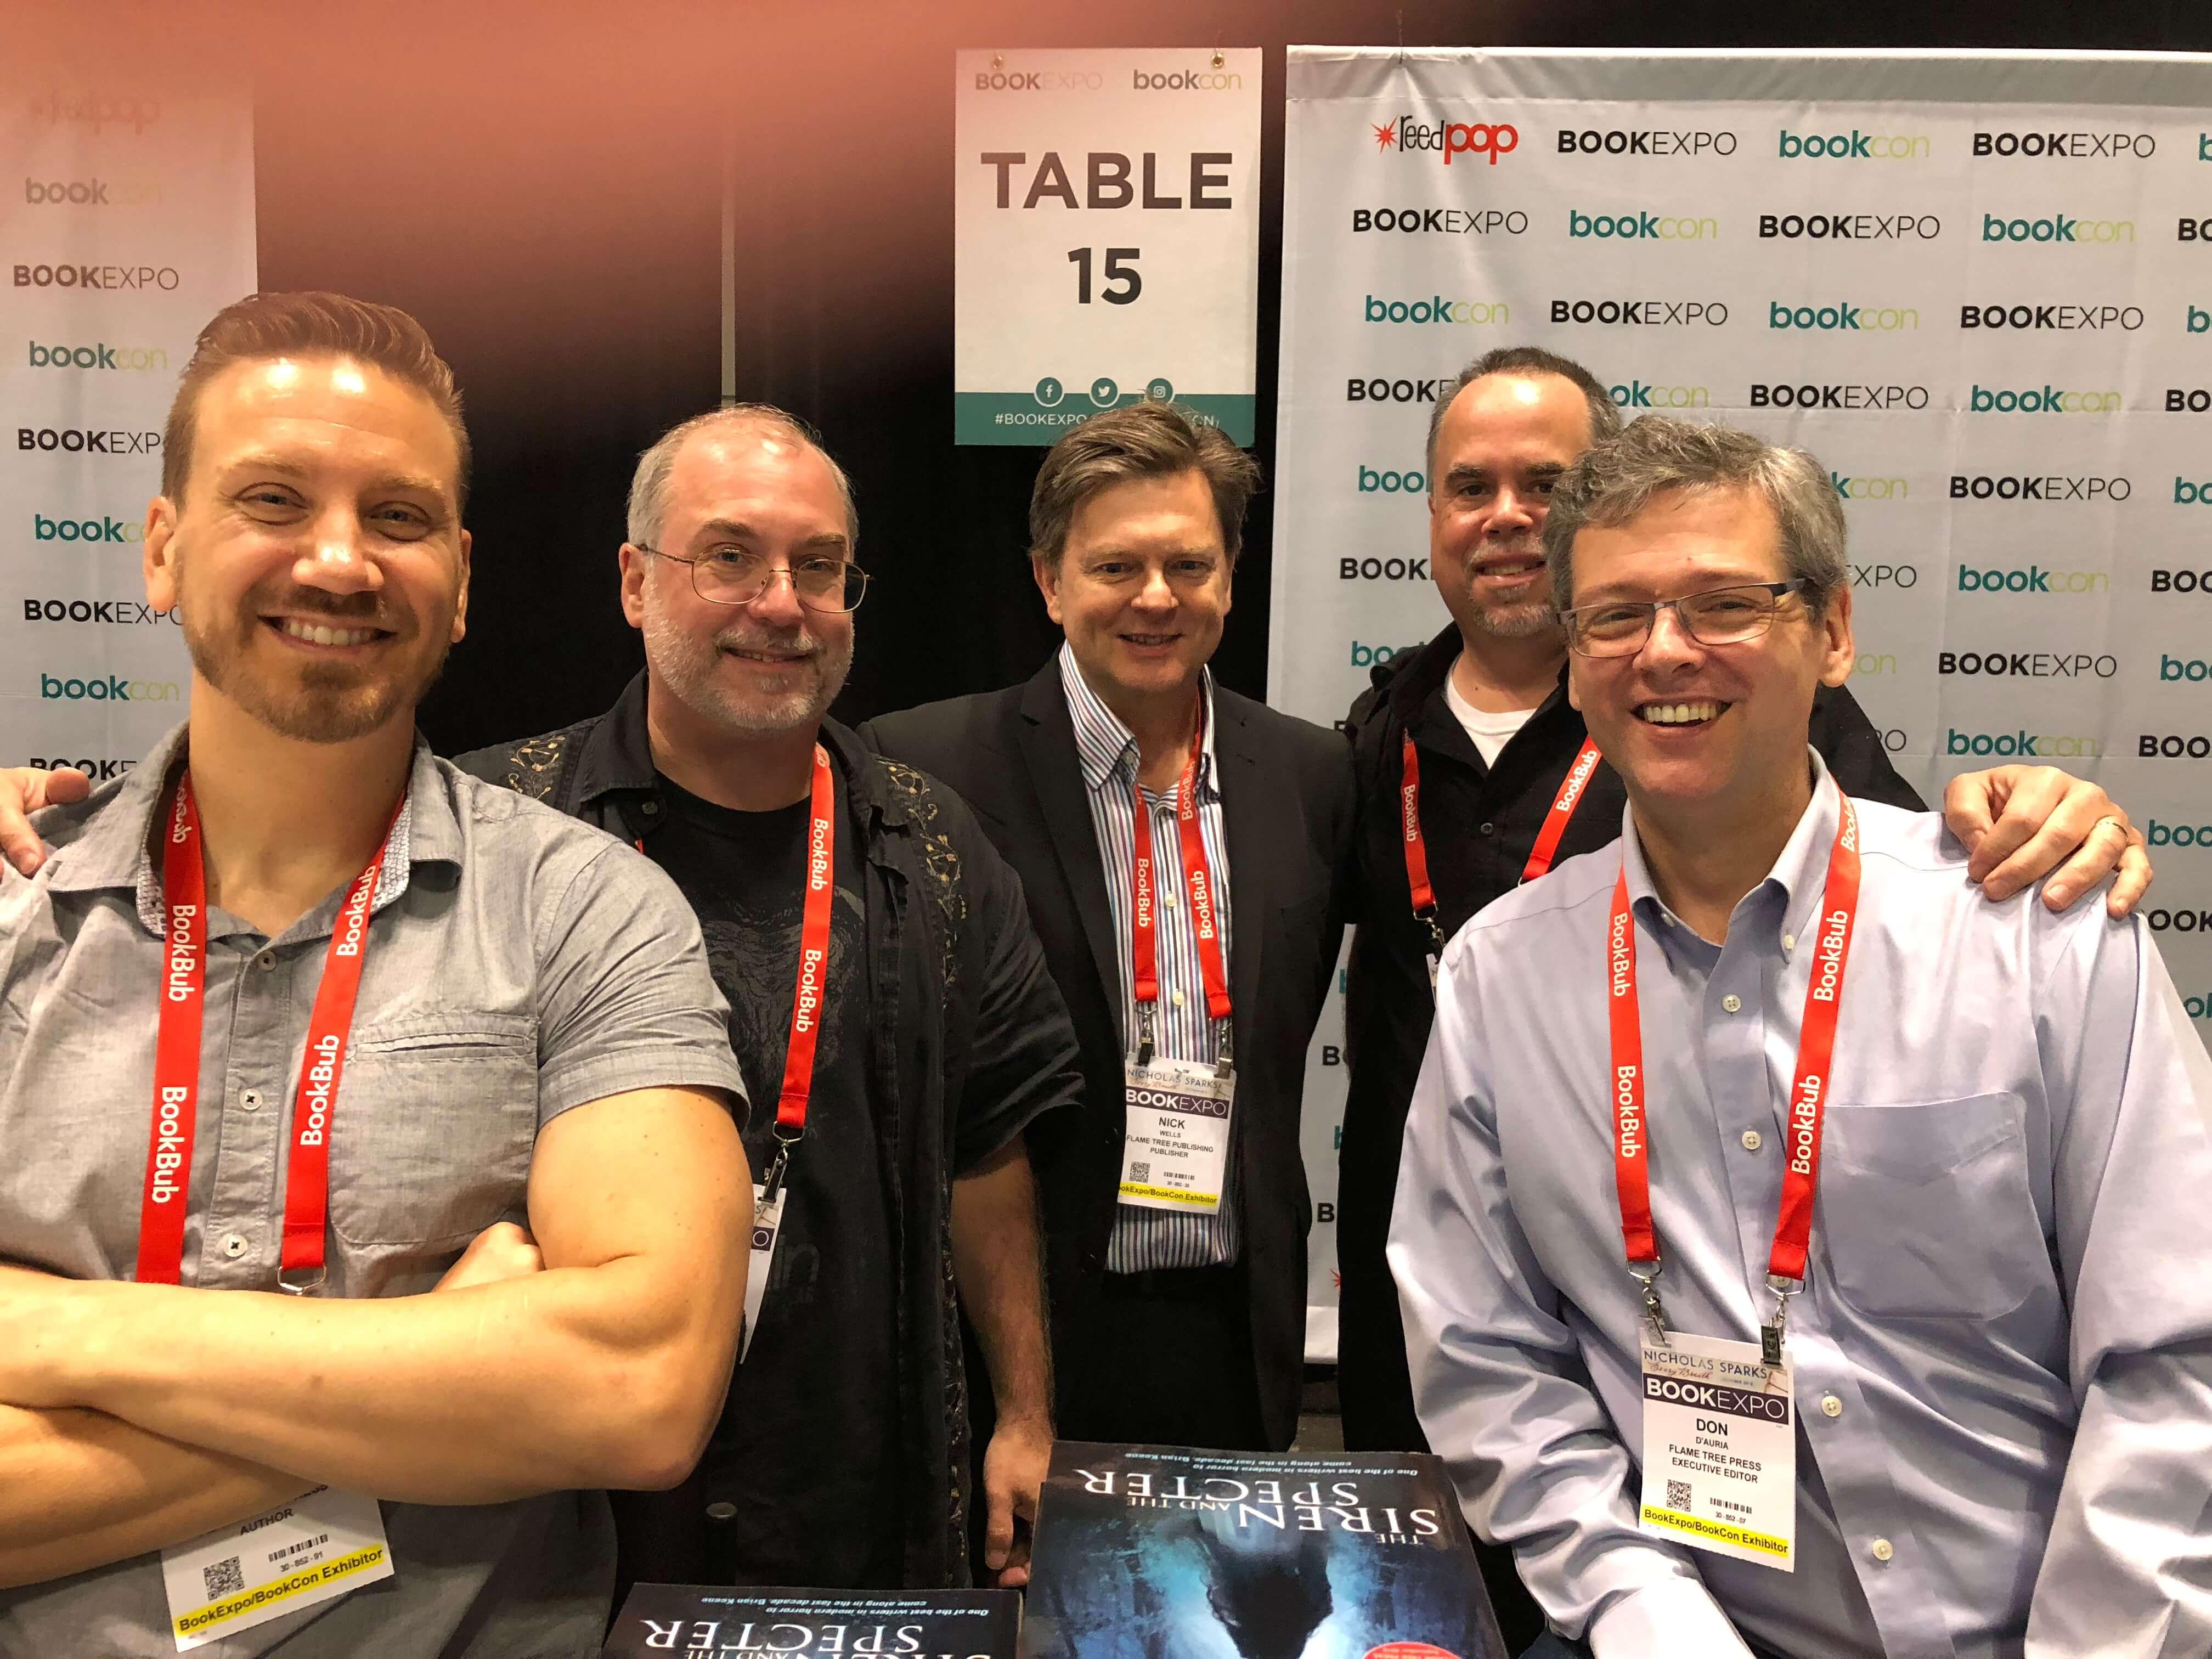 Jonathan Janz, Tim Waggoner, Hunter Shea, John Everson, Nick Wells, Don D'Auria, Flame Tree Press signing